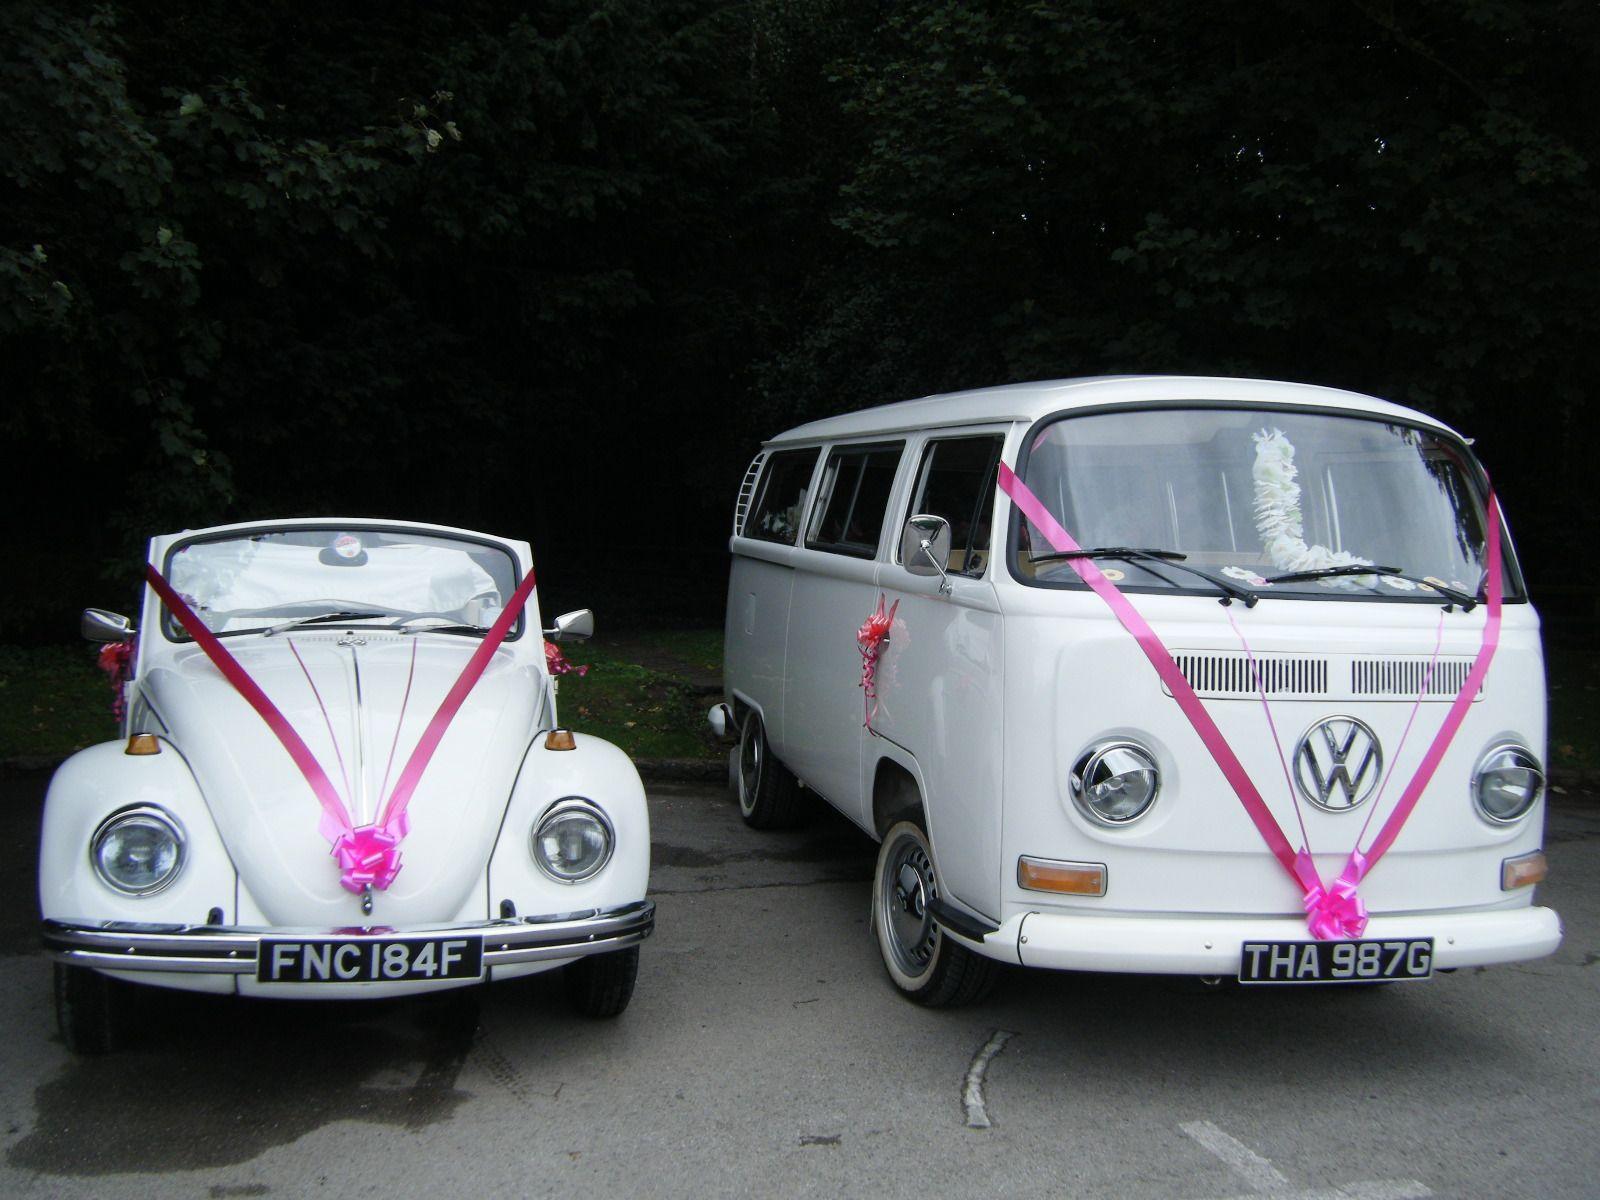 Vw beetlevw camper bus north east wedding car hire for durham vw beetlevw camper bus north east wedding car hire for durham newcastle junglespirit Gallery